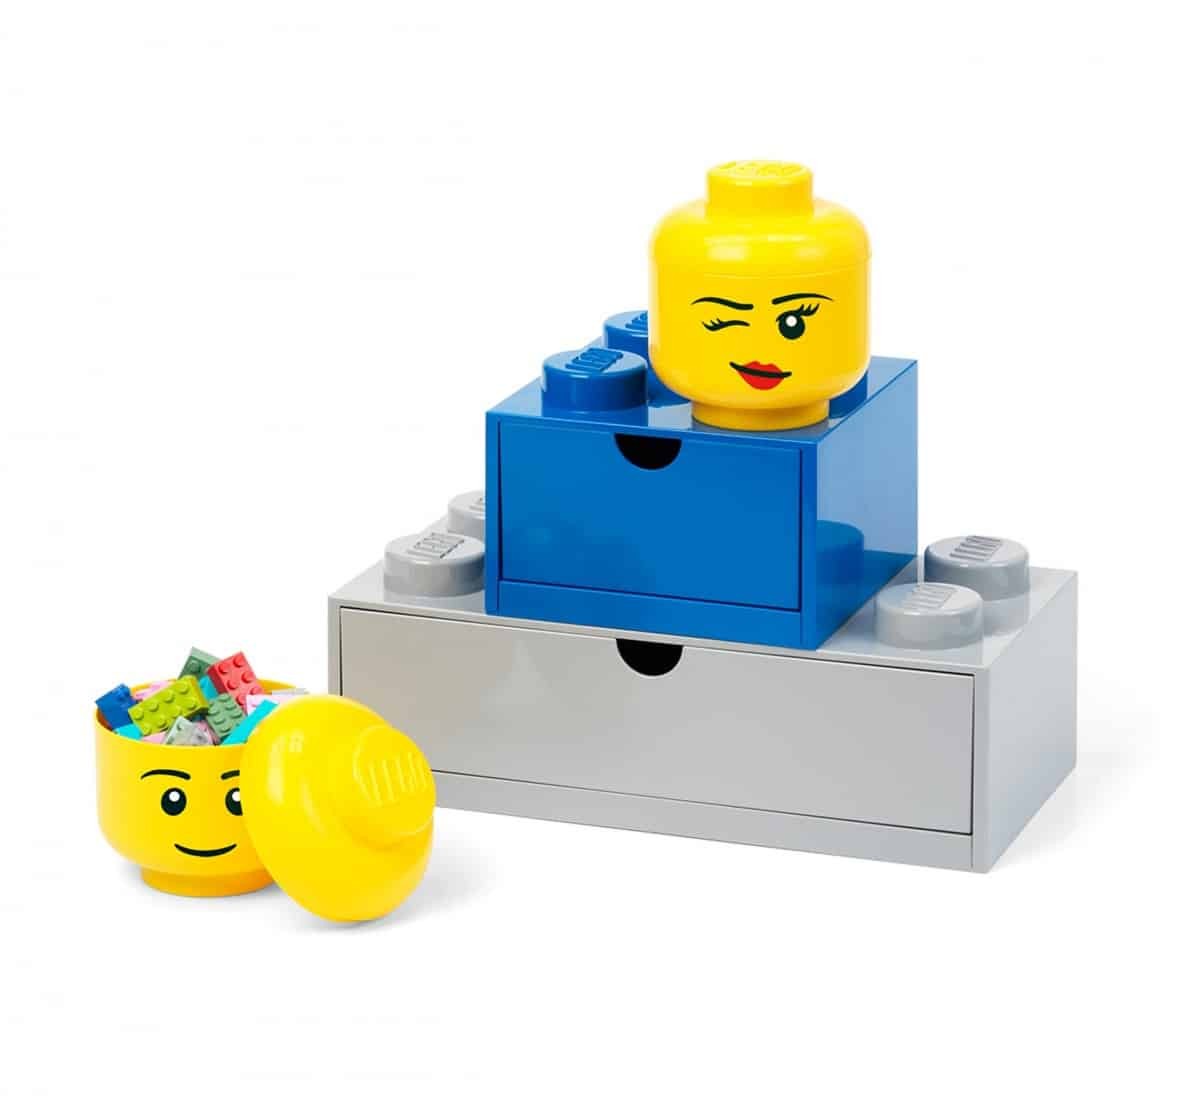 lego 5006211 zwinkerkopf mini aufbewahrungsbox scaled